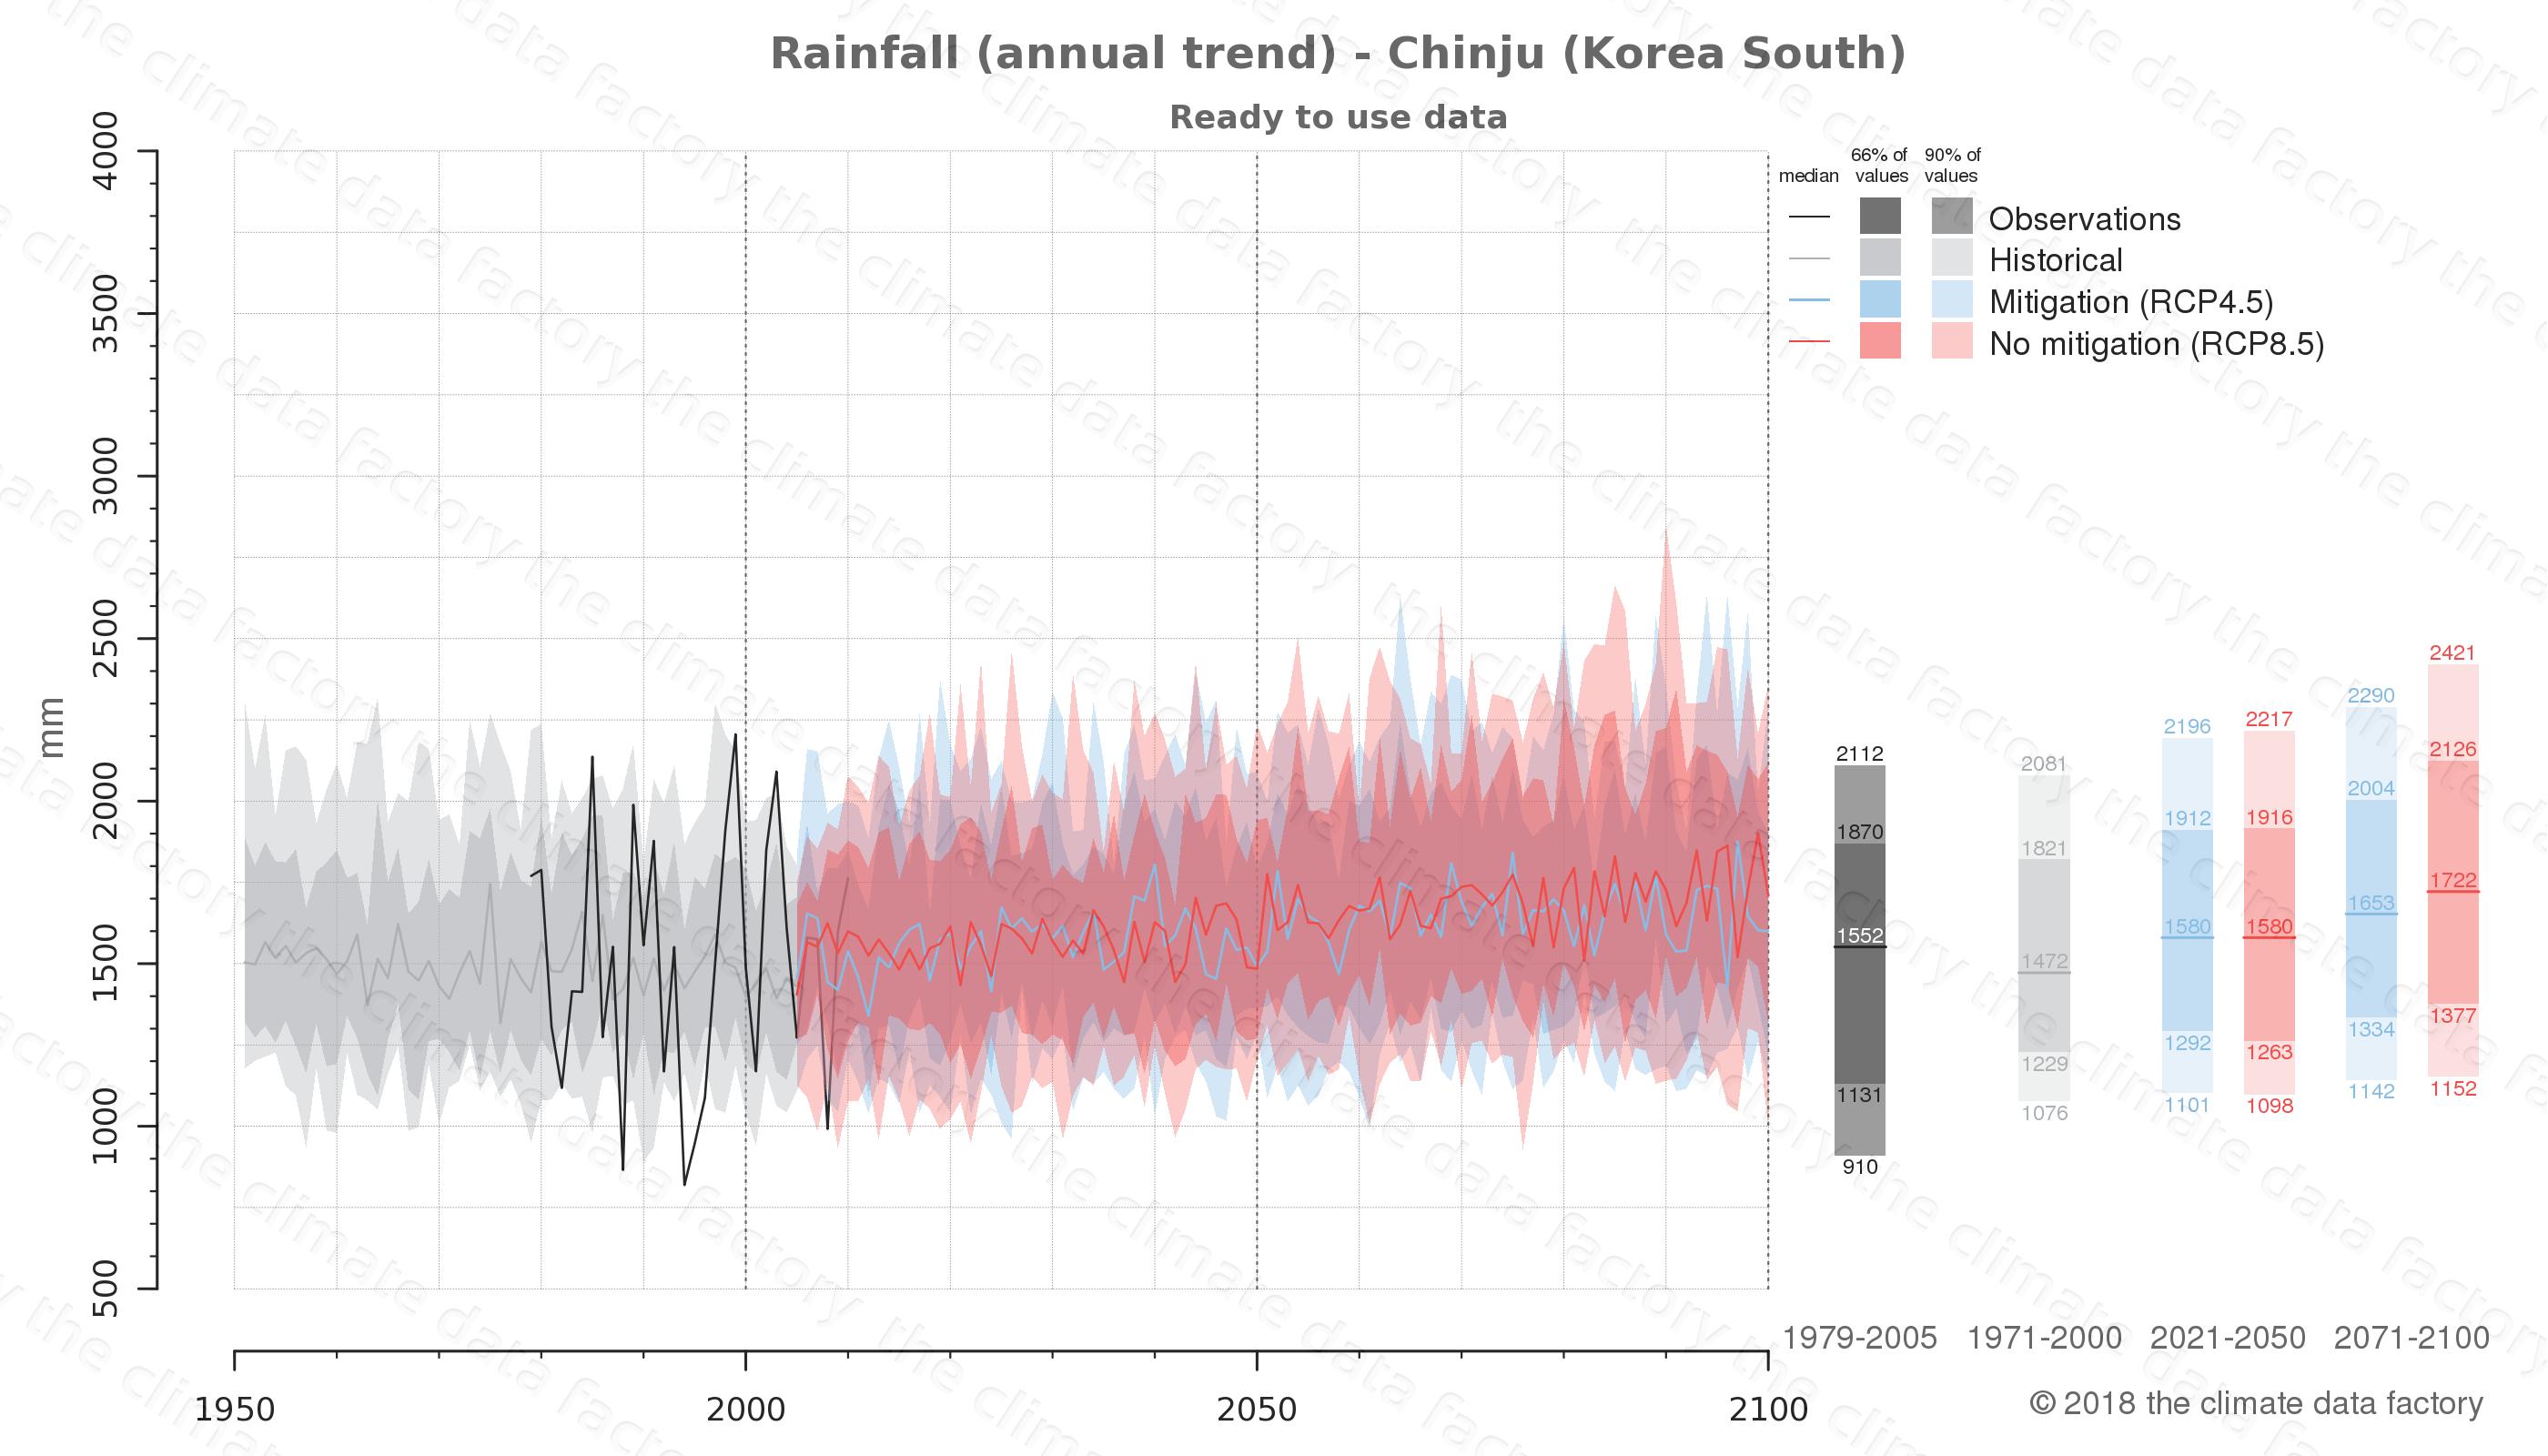 climate change data policy adaptation climate graph city data rainfall chinju south korea